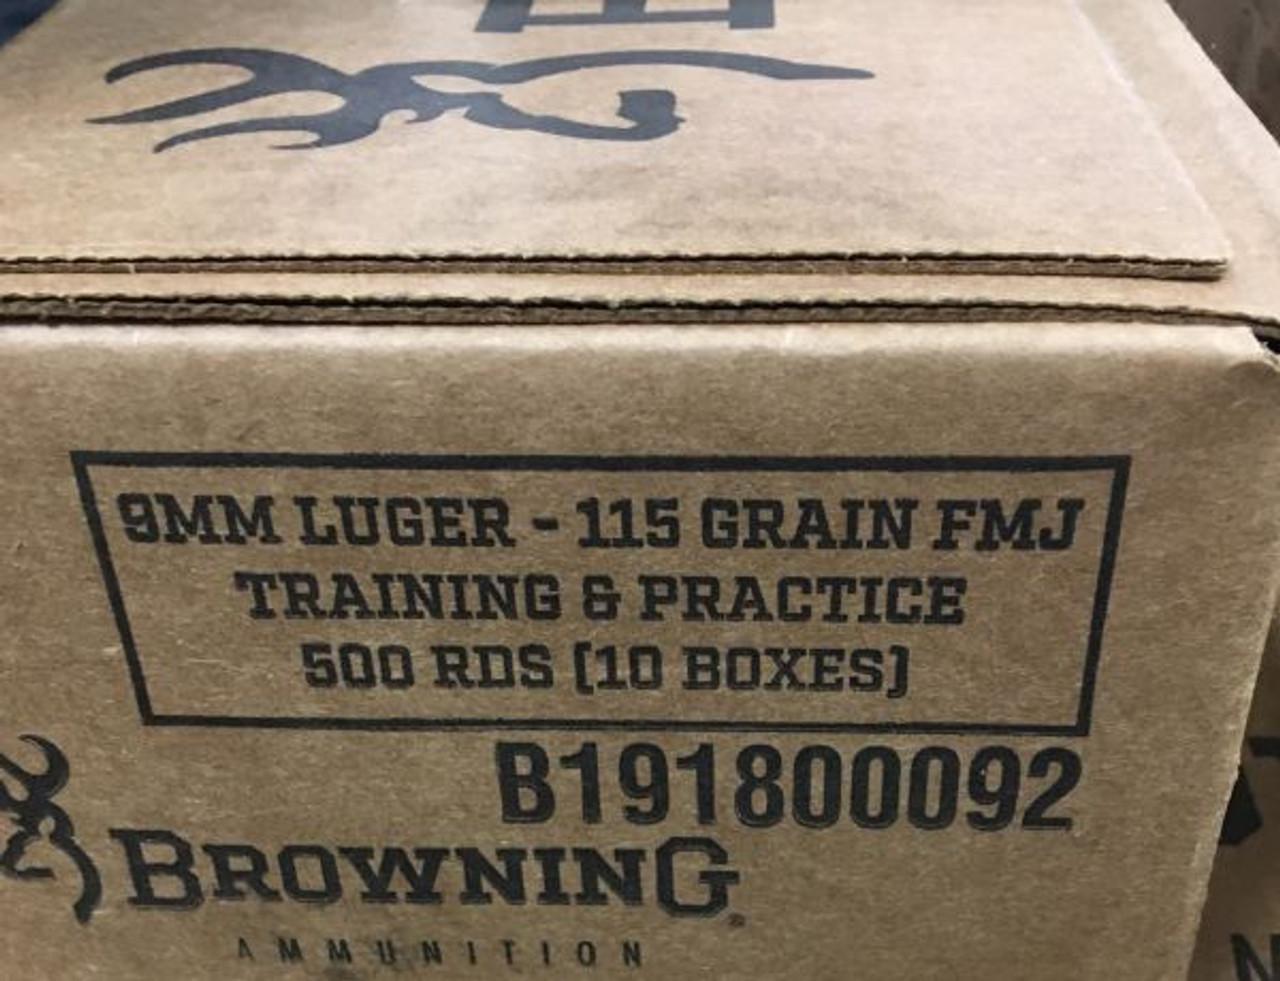 Browning 9mm 115gr Training & Practice Full Metal Jacket Ammunition B191800092